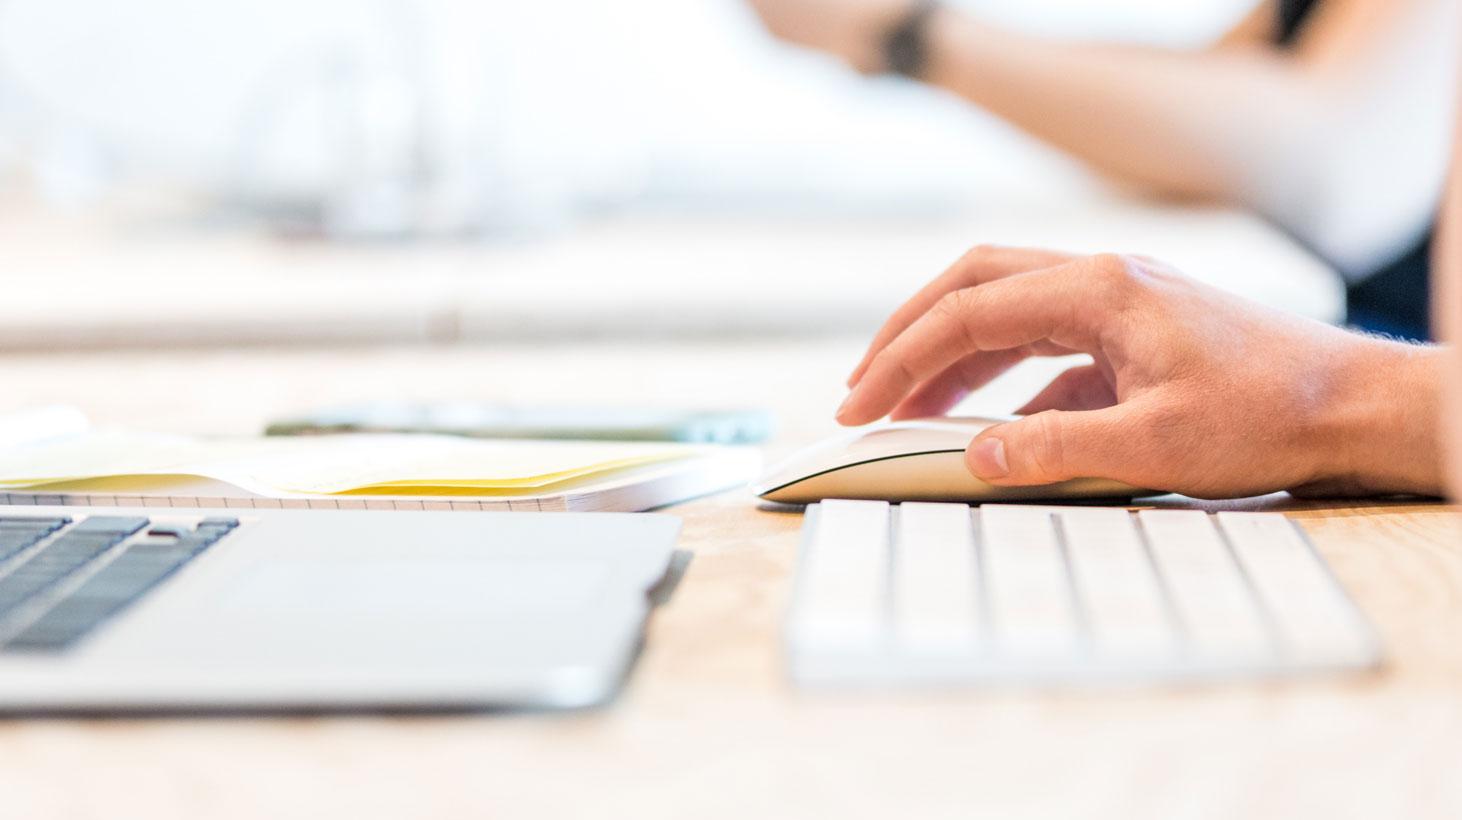 Lanzan sistema de auditorias de negocios digitales para empresas a través de Roier.ai